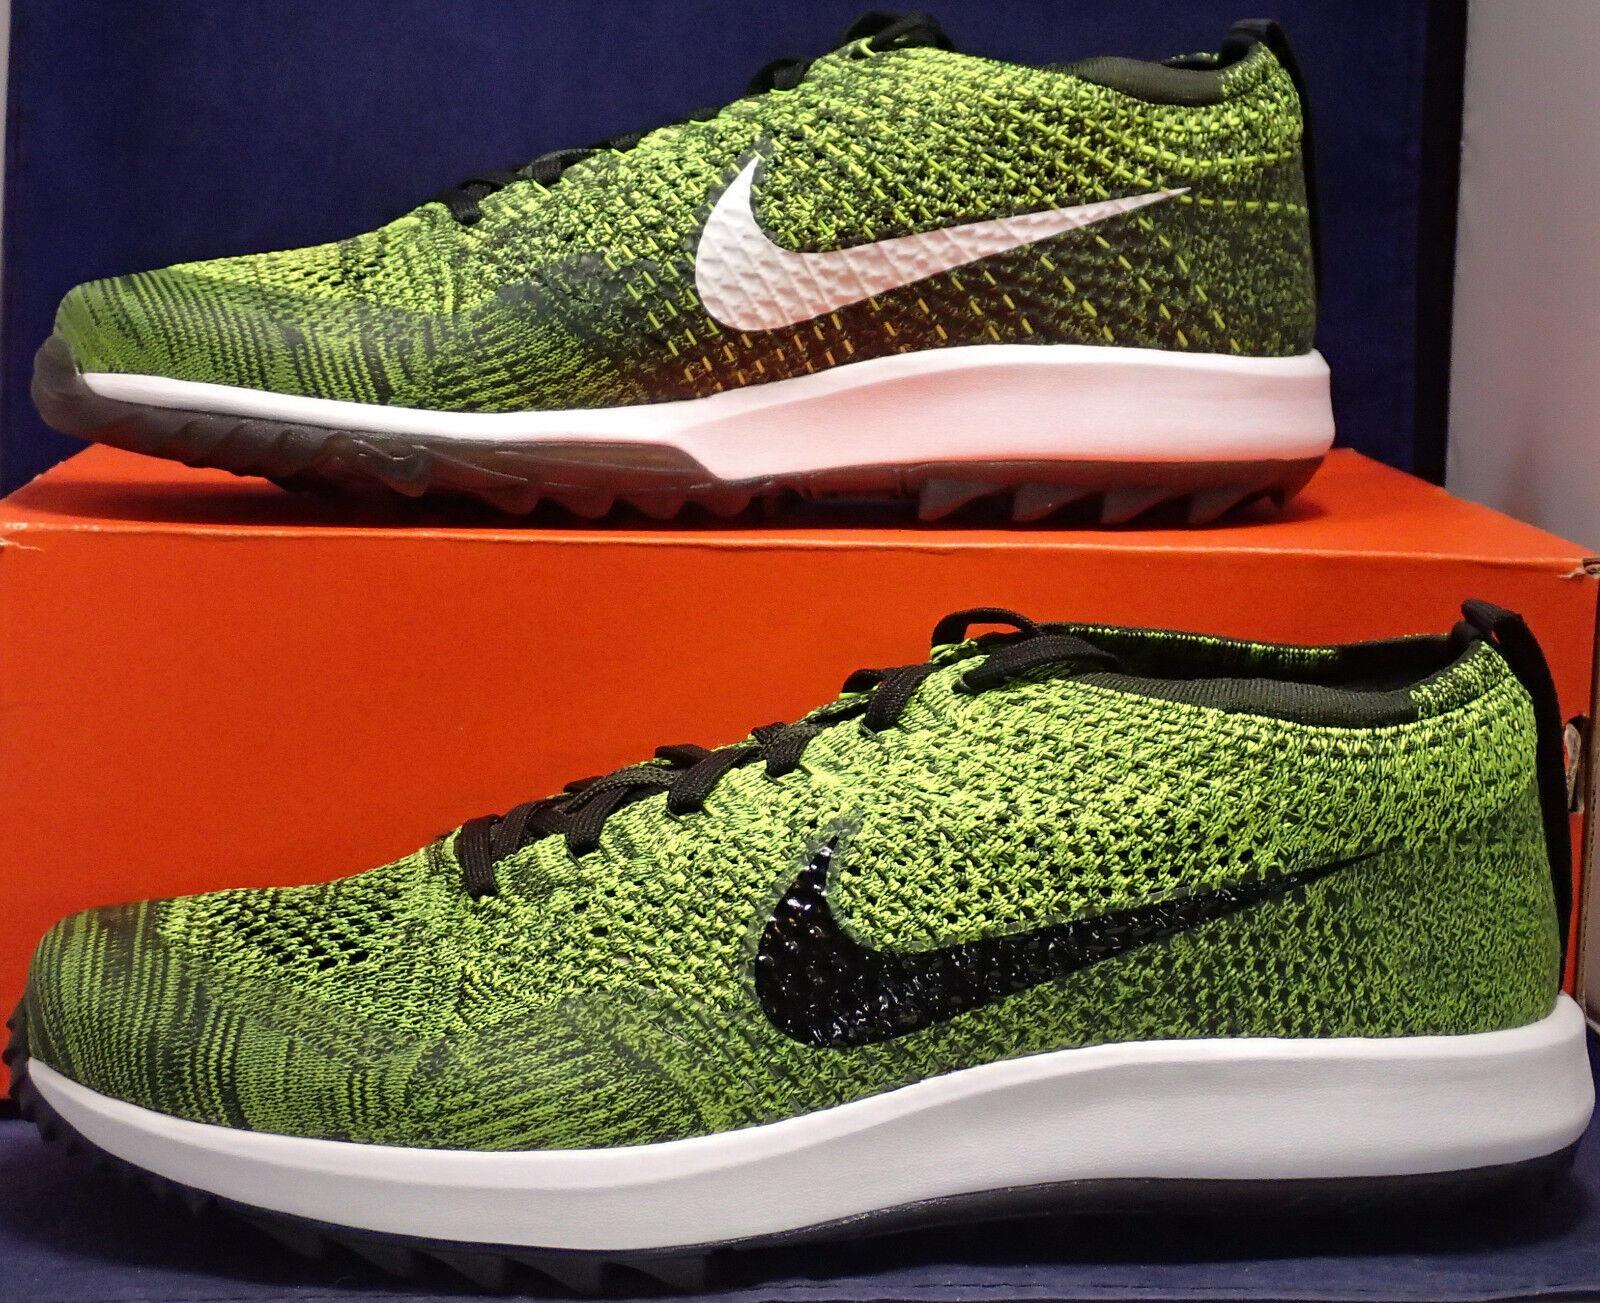 Nike flyknit racer scarpe 10 da golf volt nero 10 sequoia verde g 10 nero   50f423